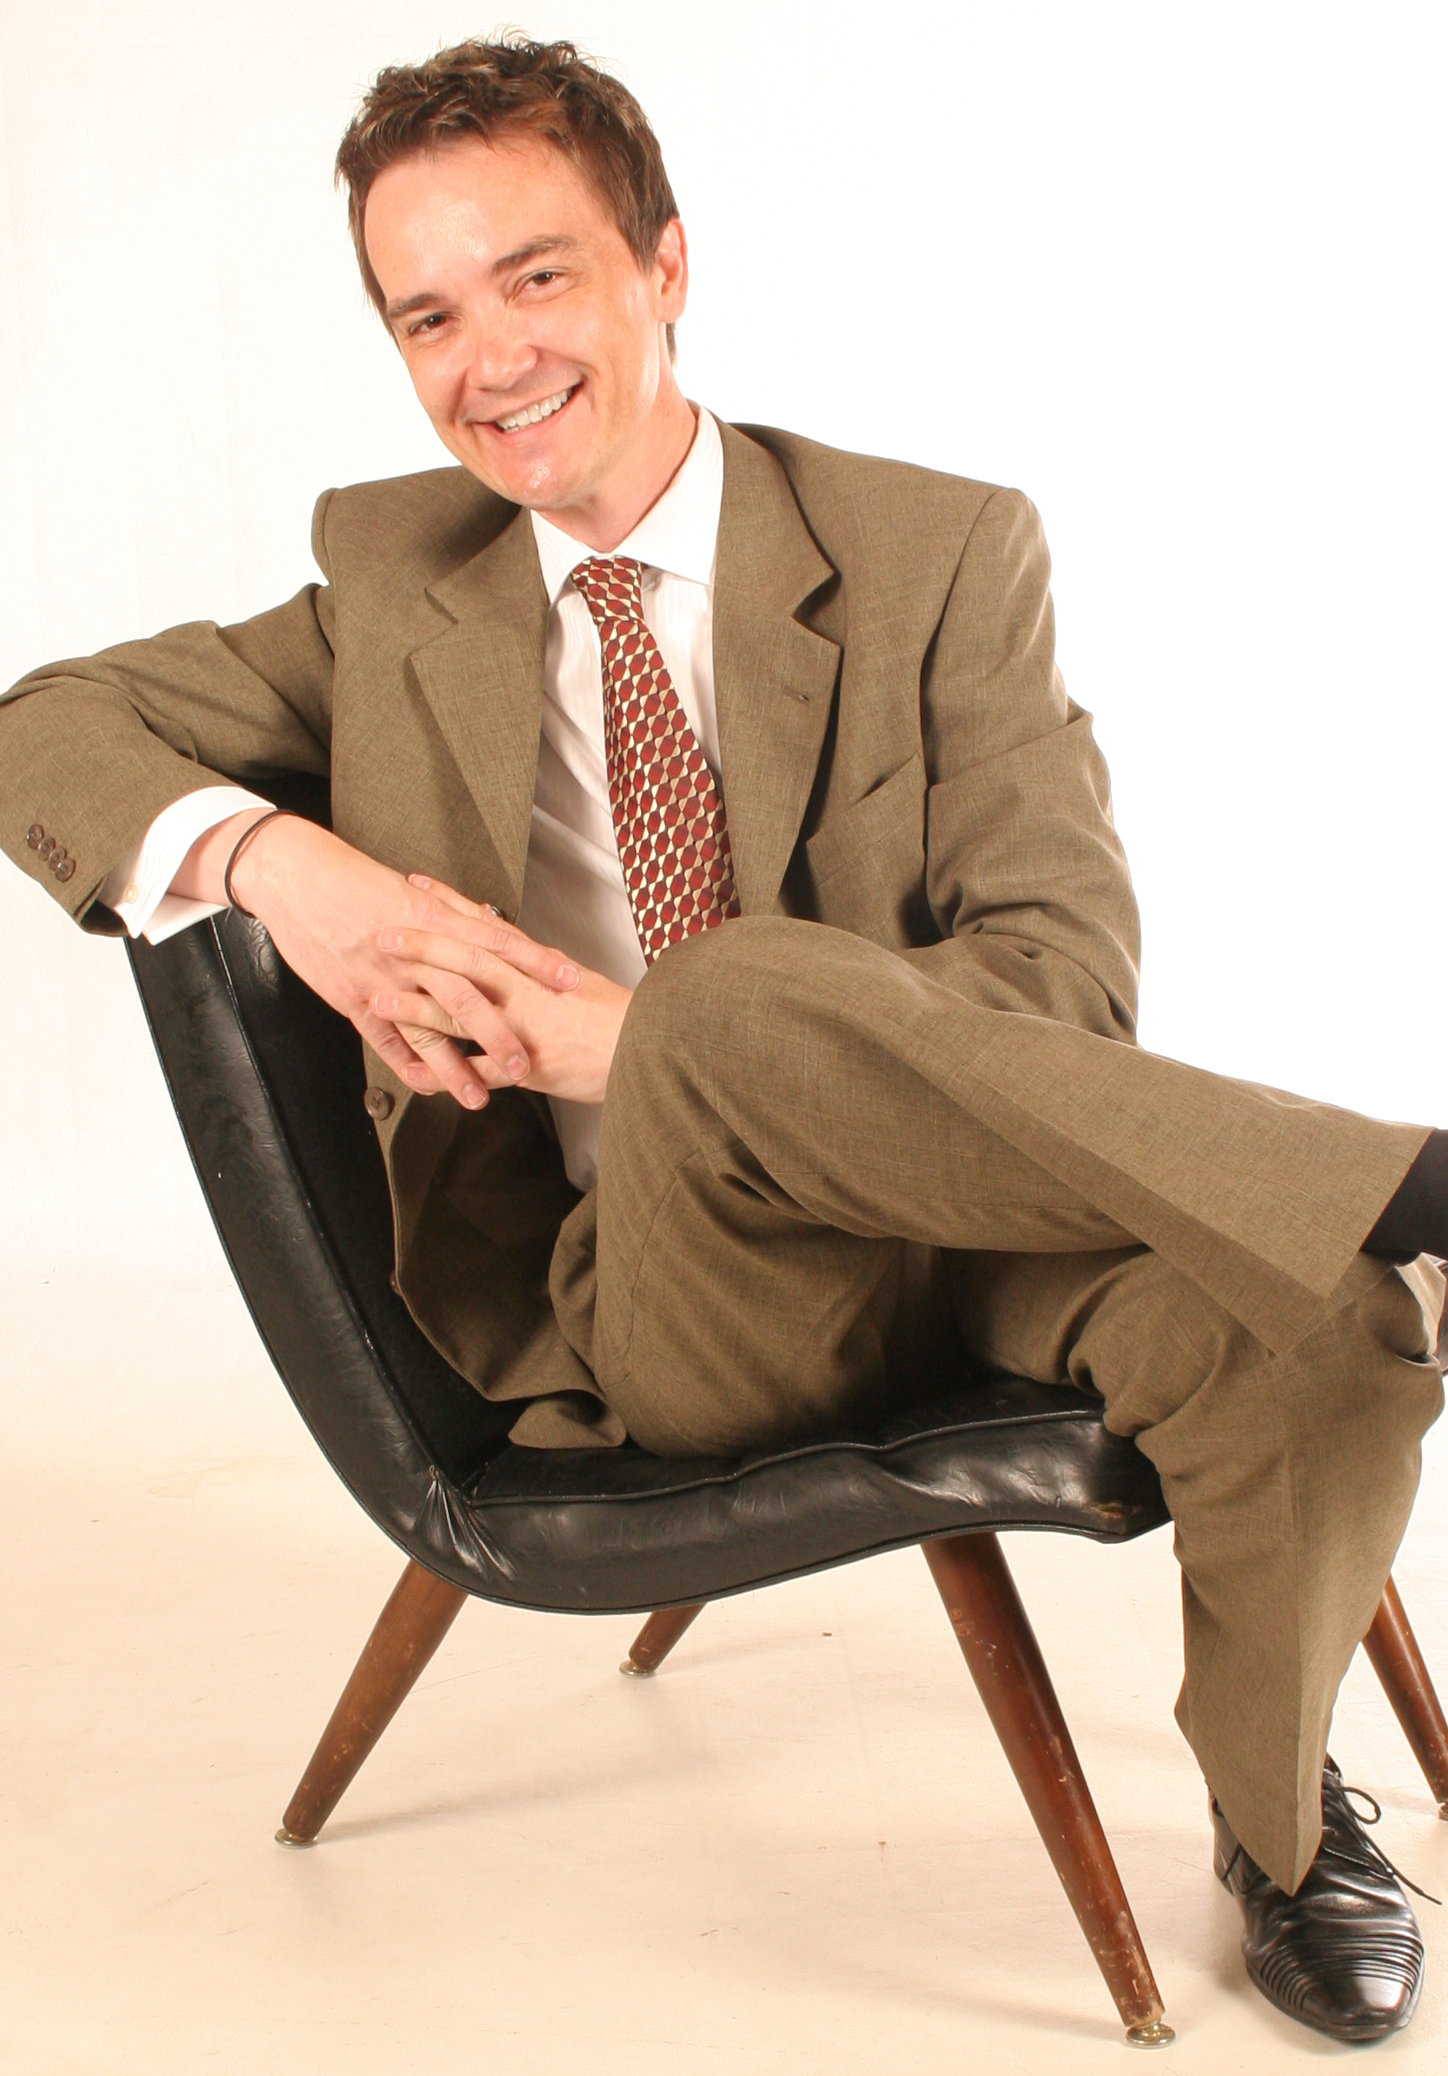 brown suit chair-cropped.jpg